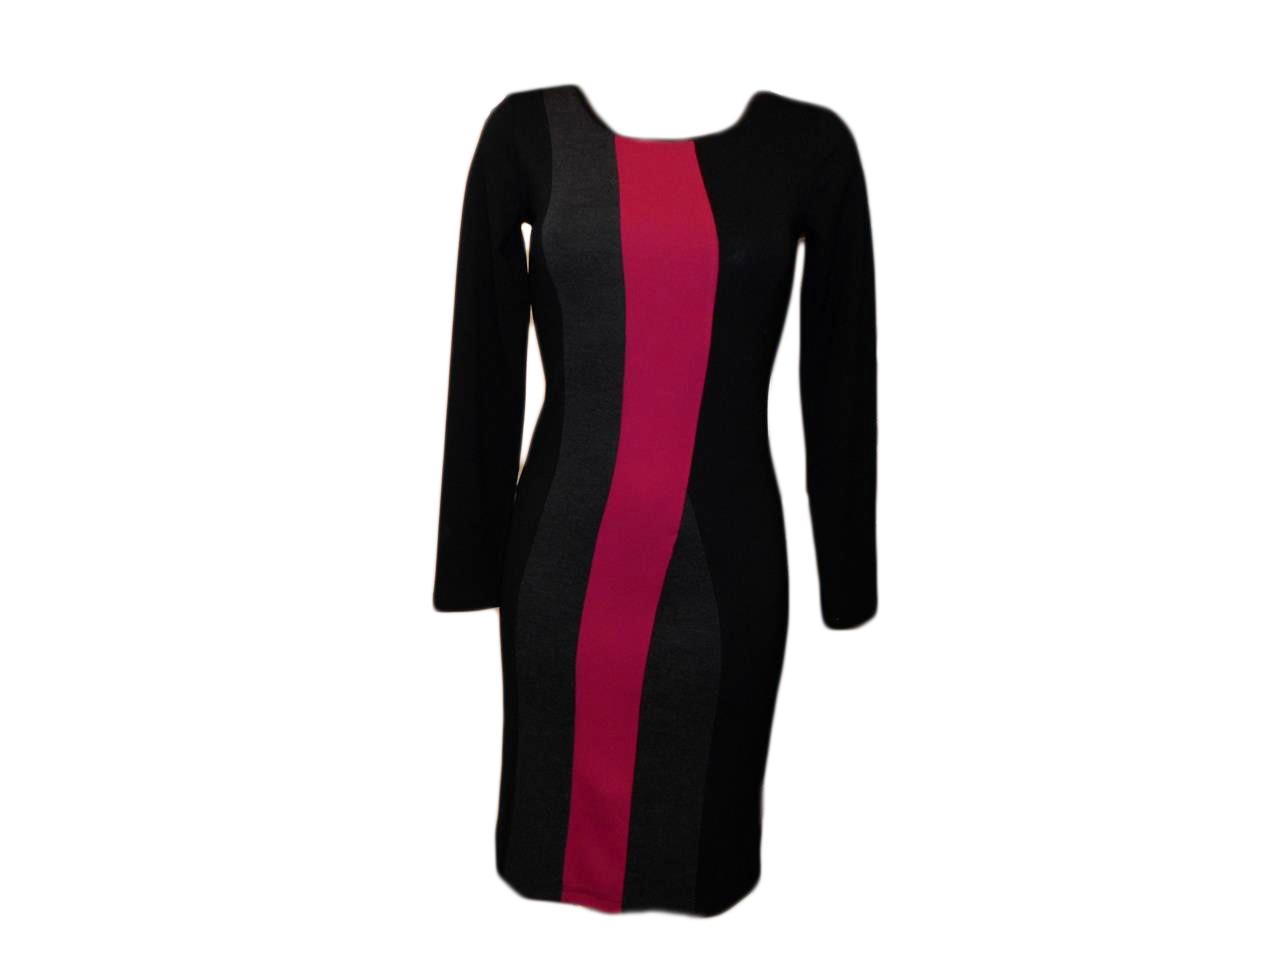 Dámské šaty Mika DR - Favab Barva: černo-šedá, Velikost: S